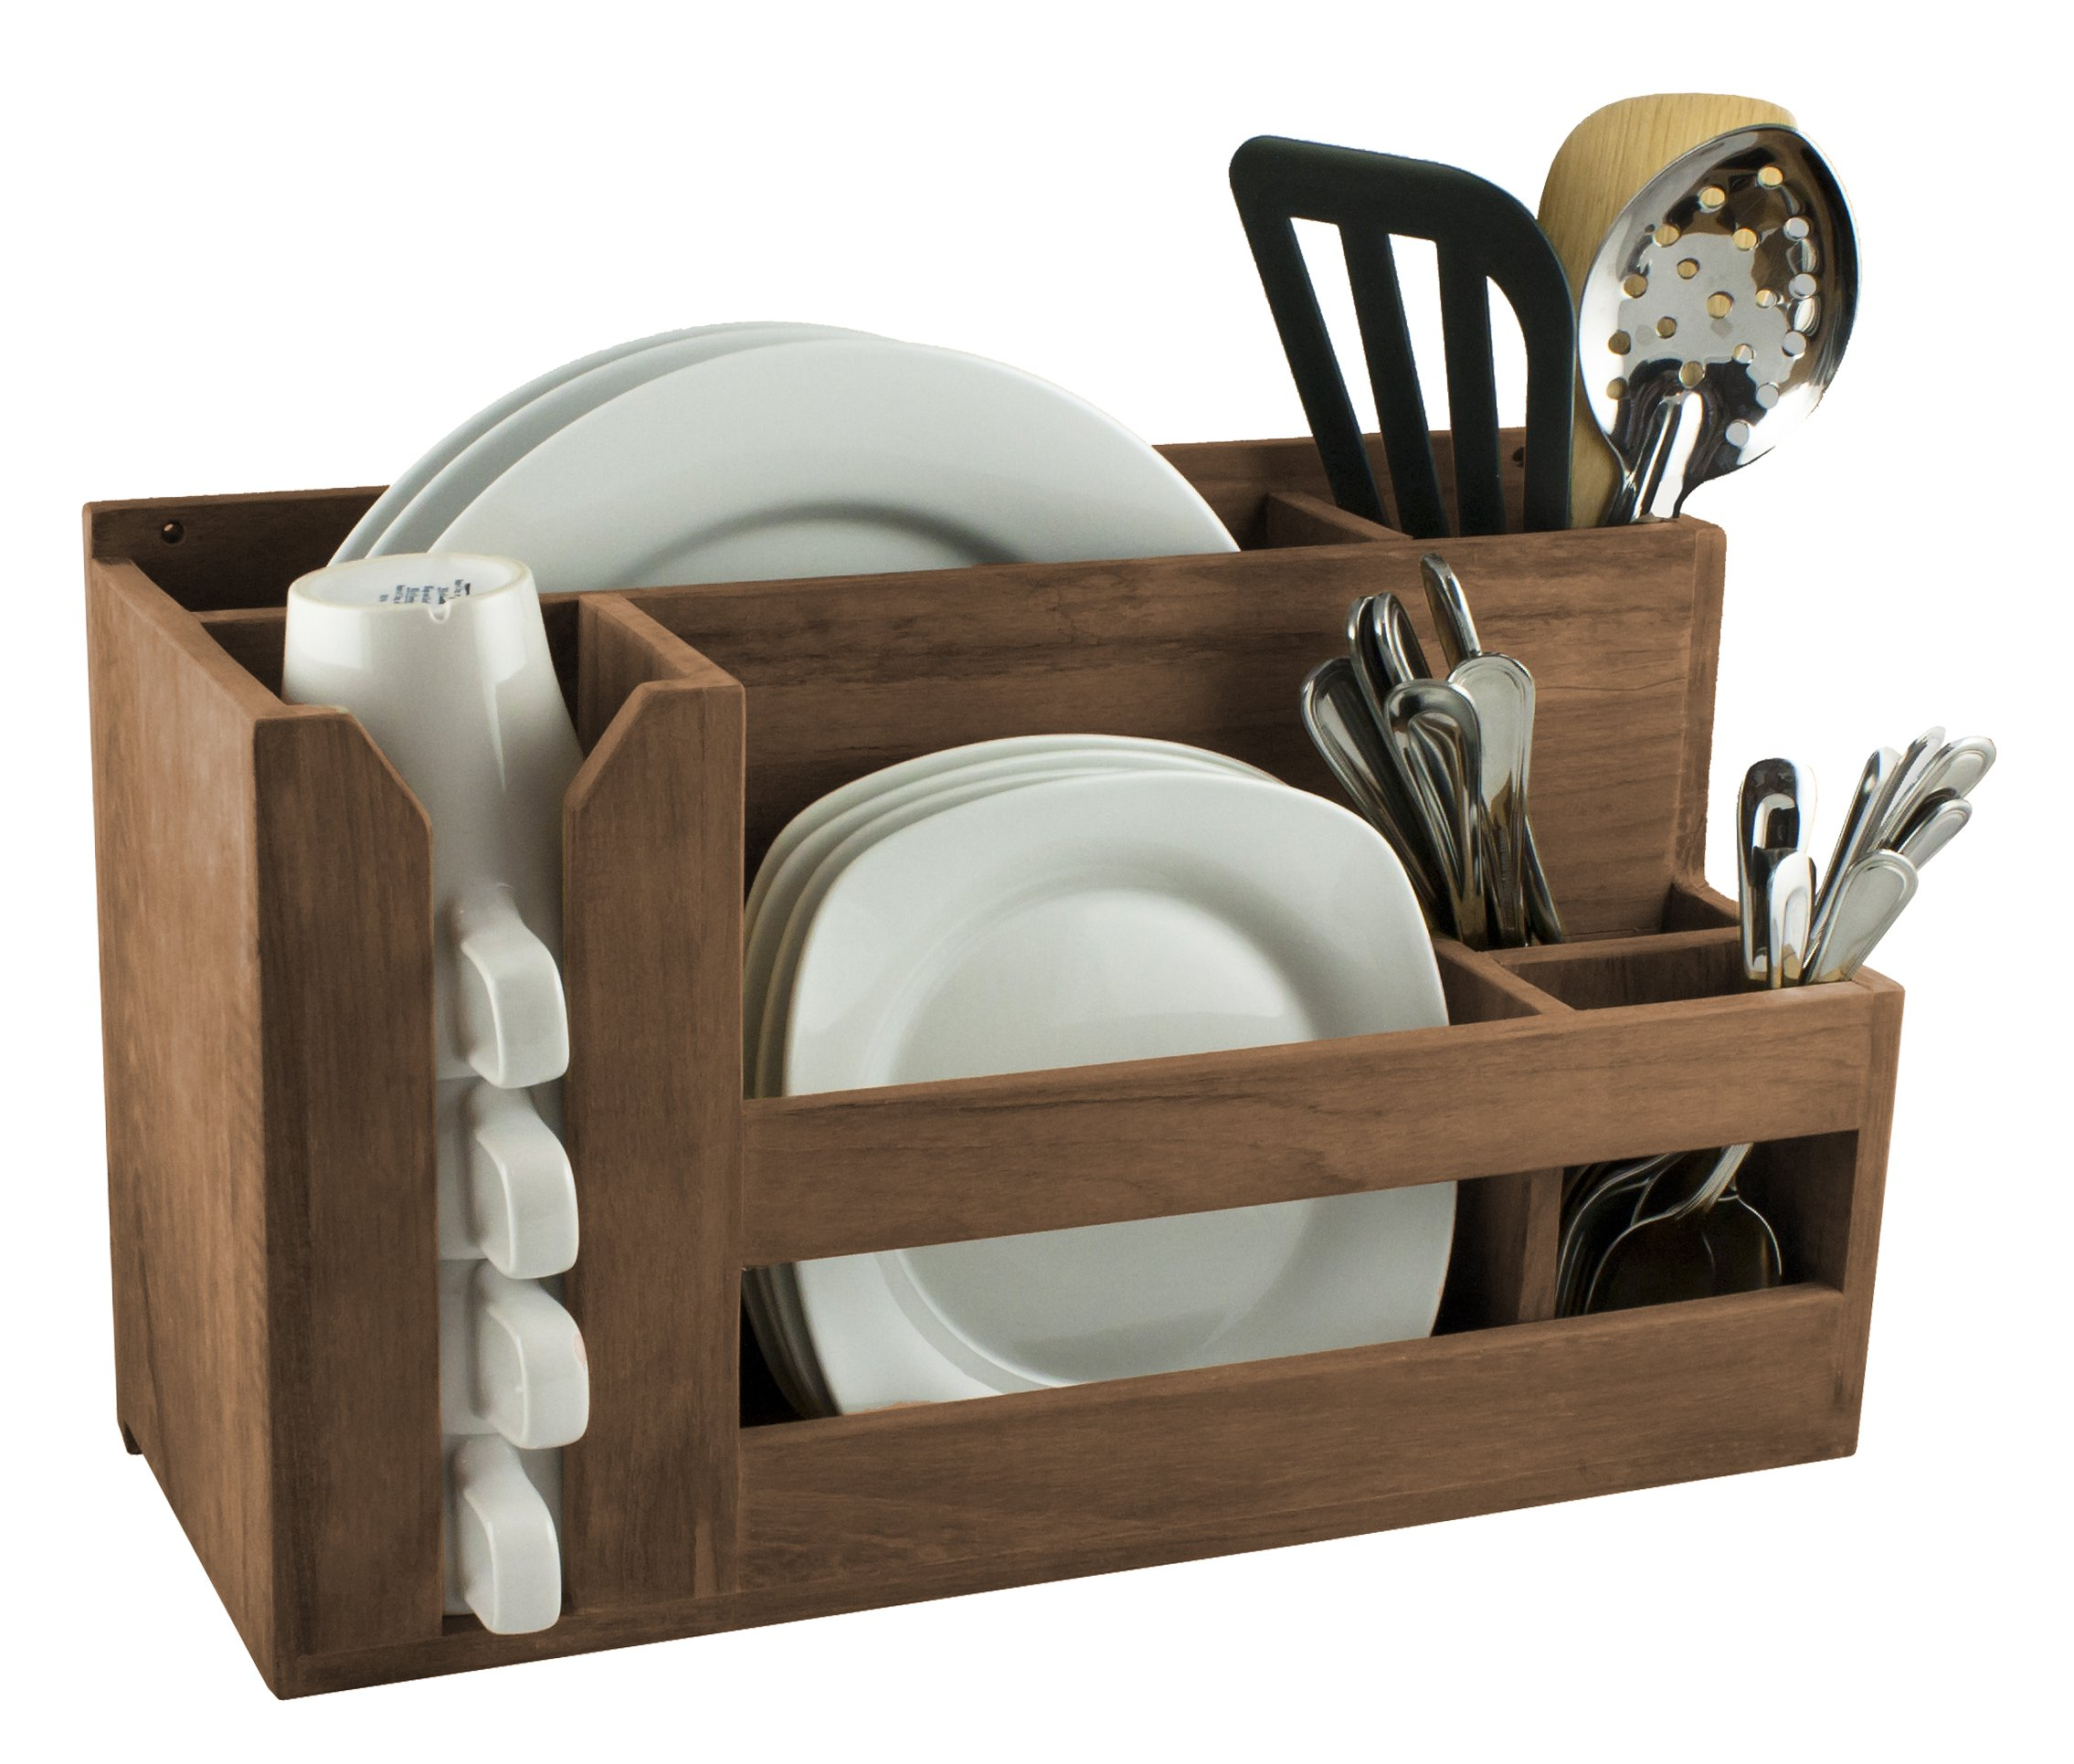 SeaTeak 62404 Dish/Cup/Utensil Holder